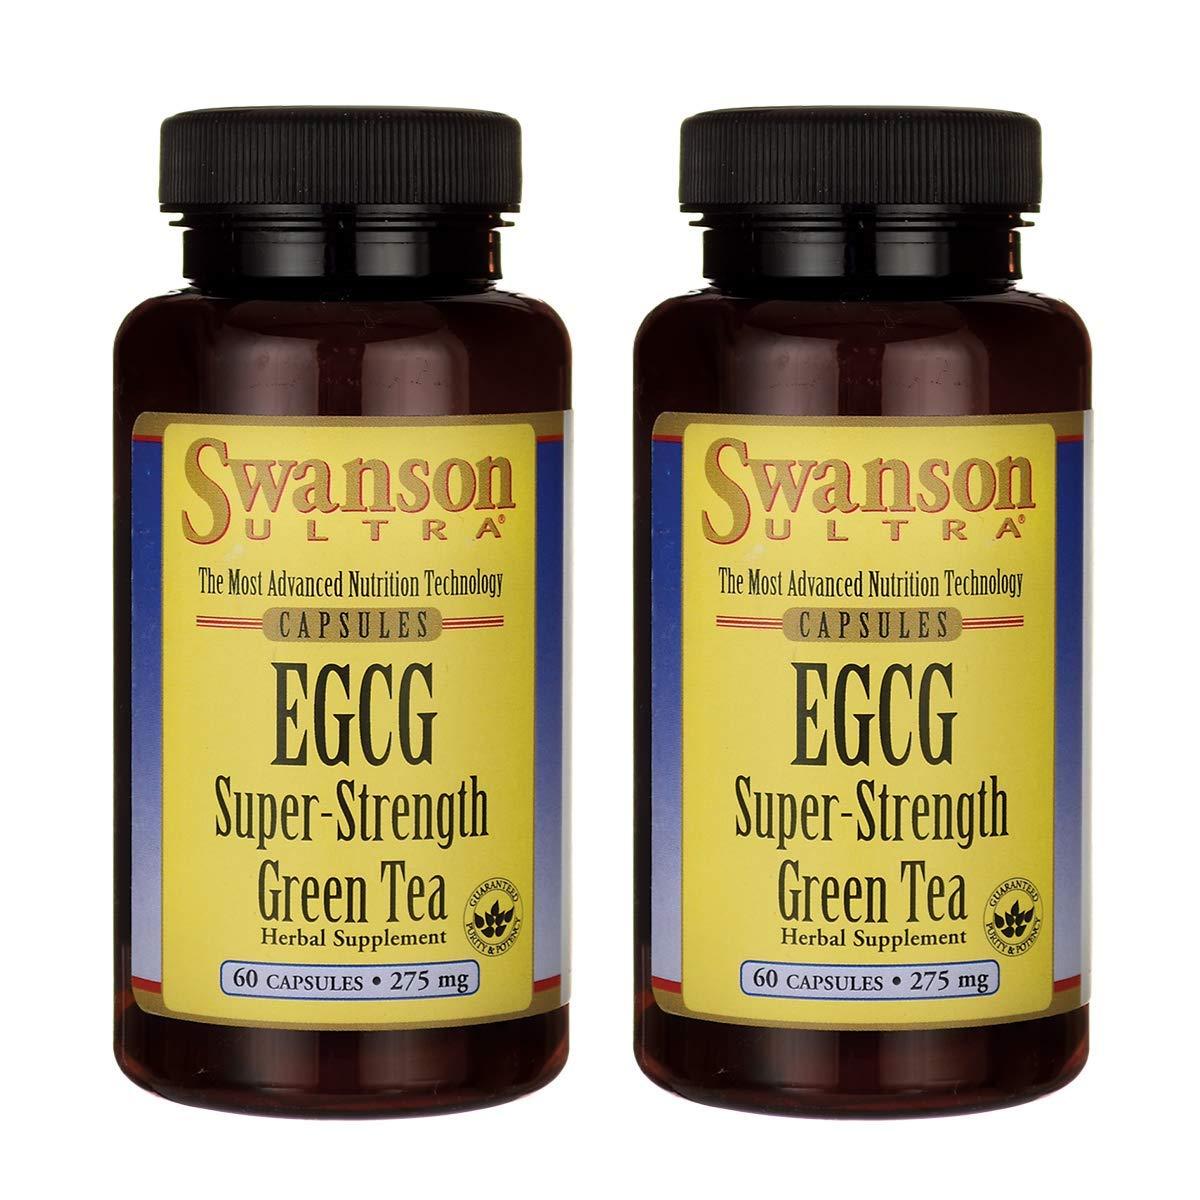 Swanson Egcg Super-Strength Green Tea 275 Milligrams 60 Capsules (2 Pack)